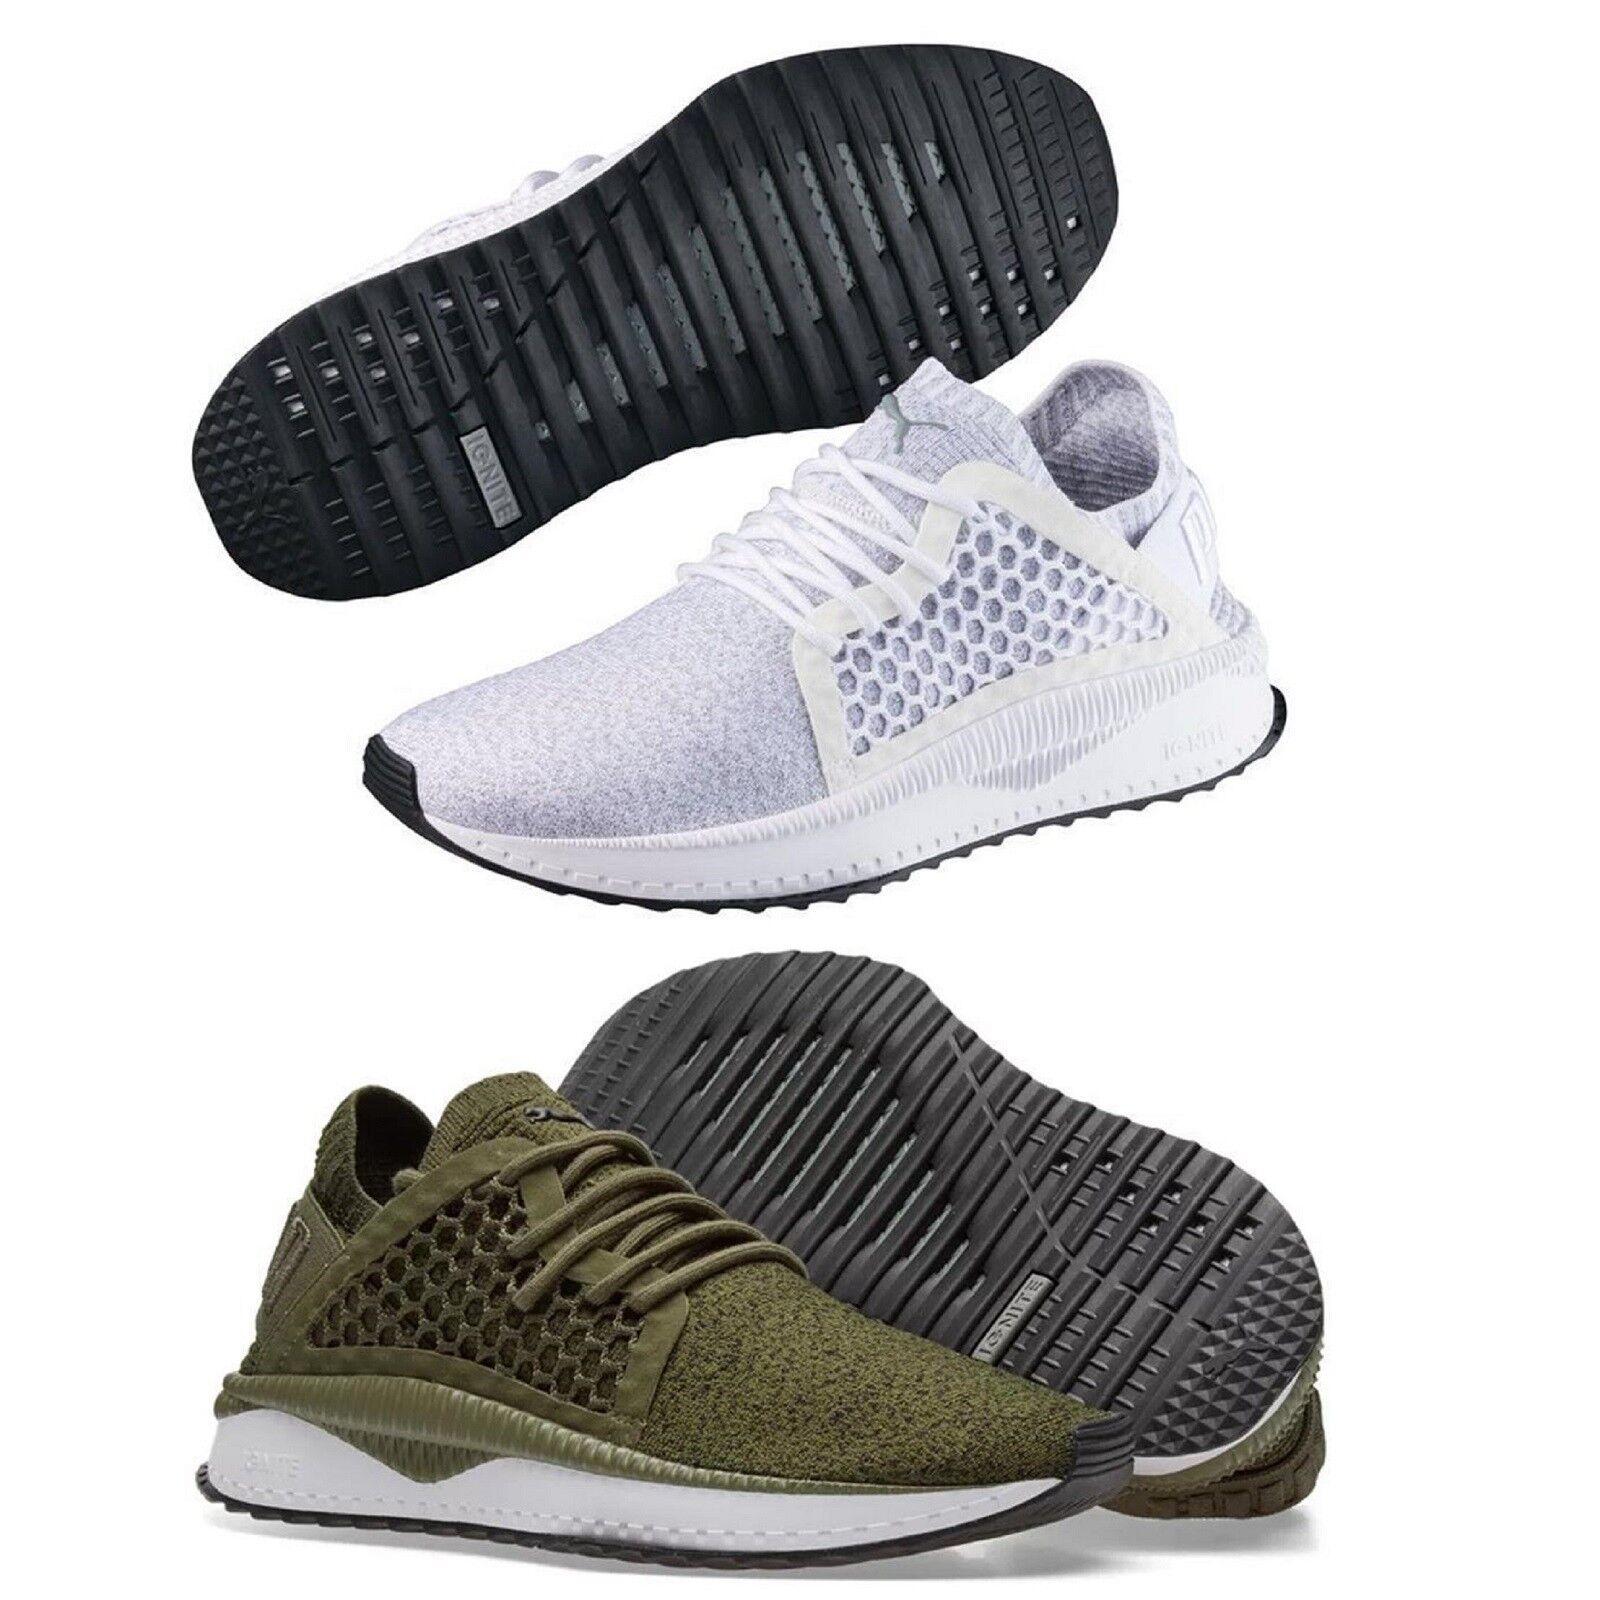 Puma TSUGI Netfit Evoknit hommes Trainers Shinshei Cage Olive blanc Chaussures